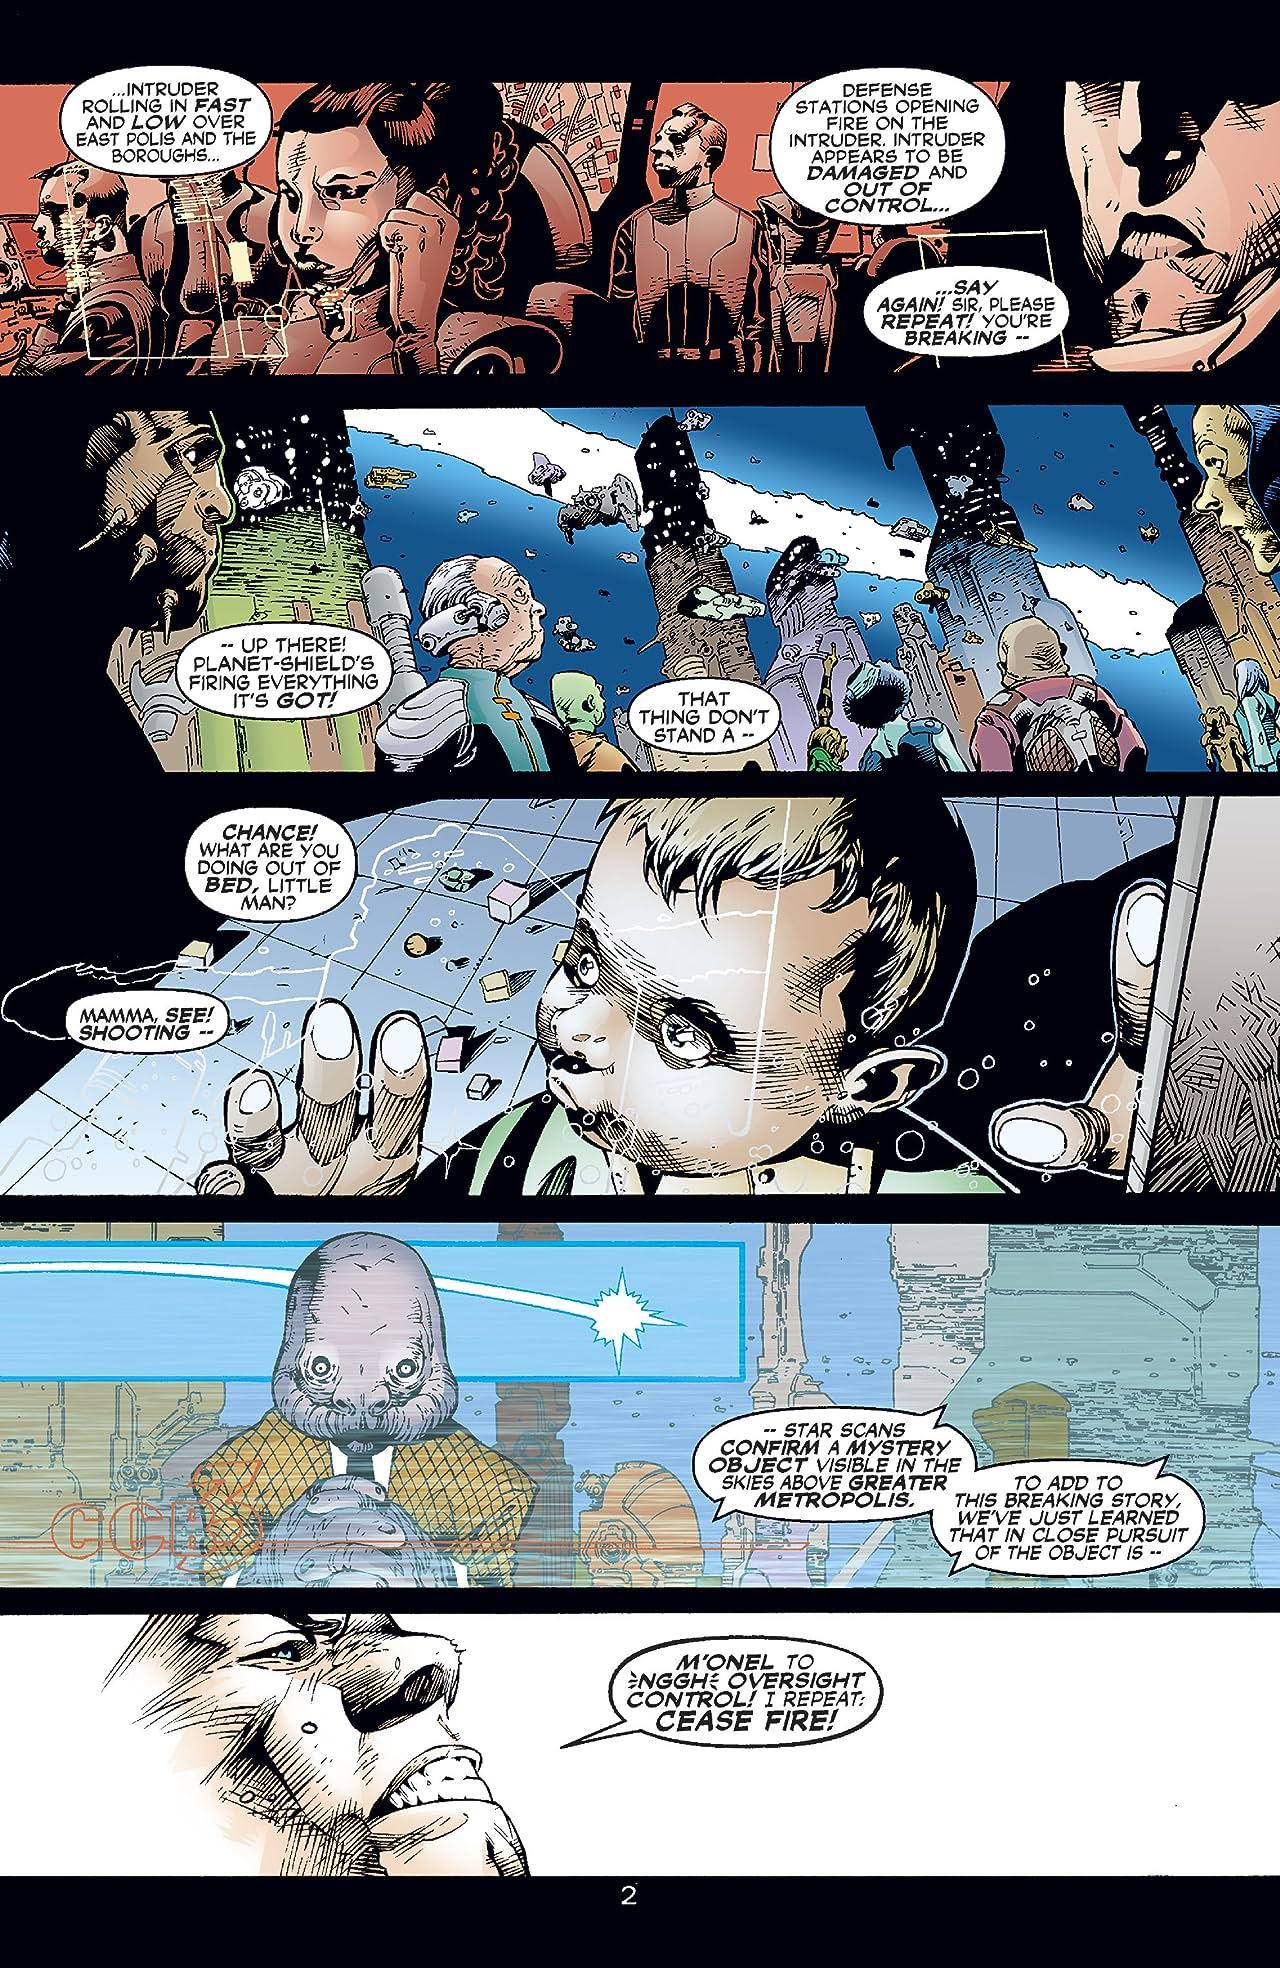 The Legion (2001-2004) #1